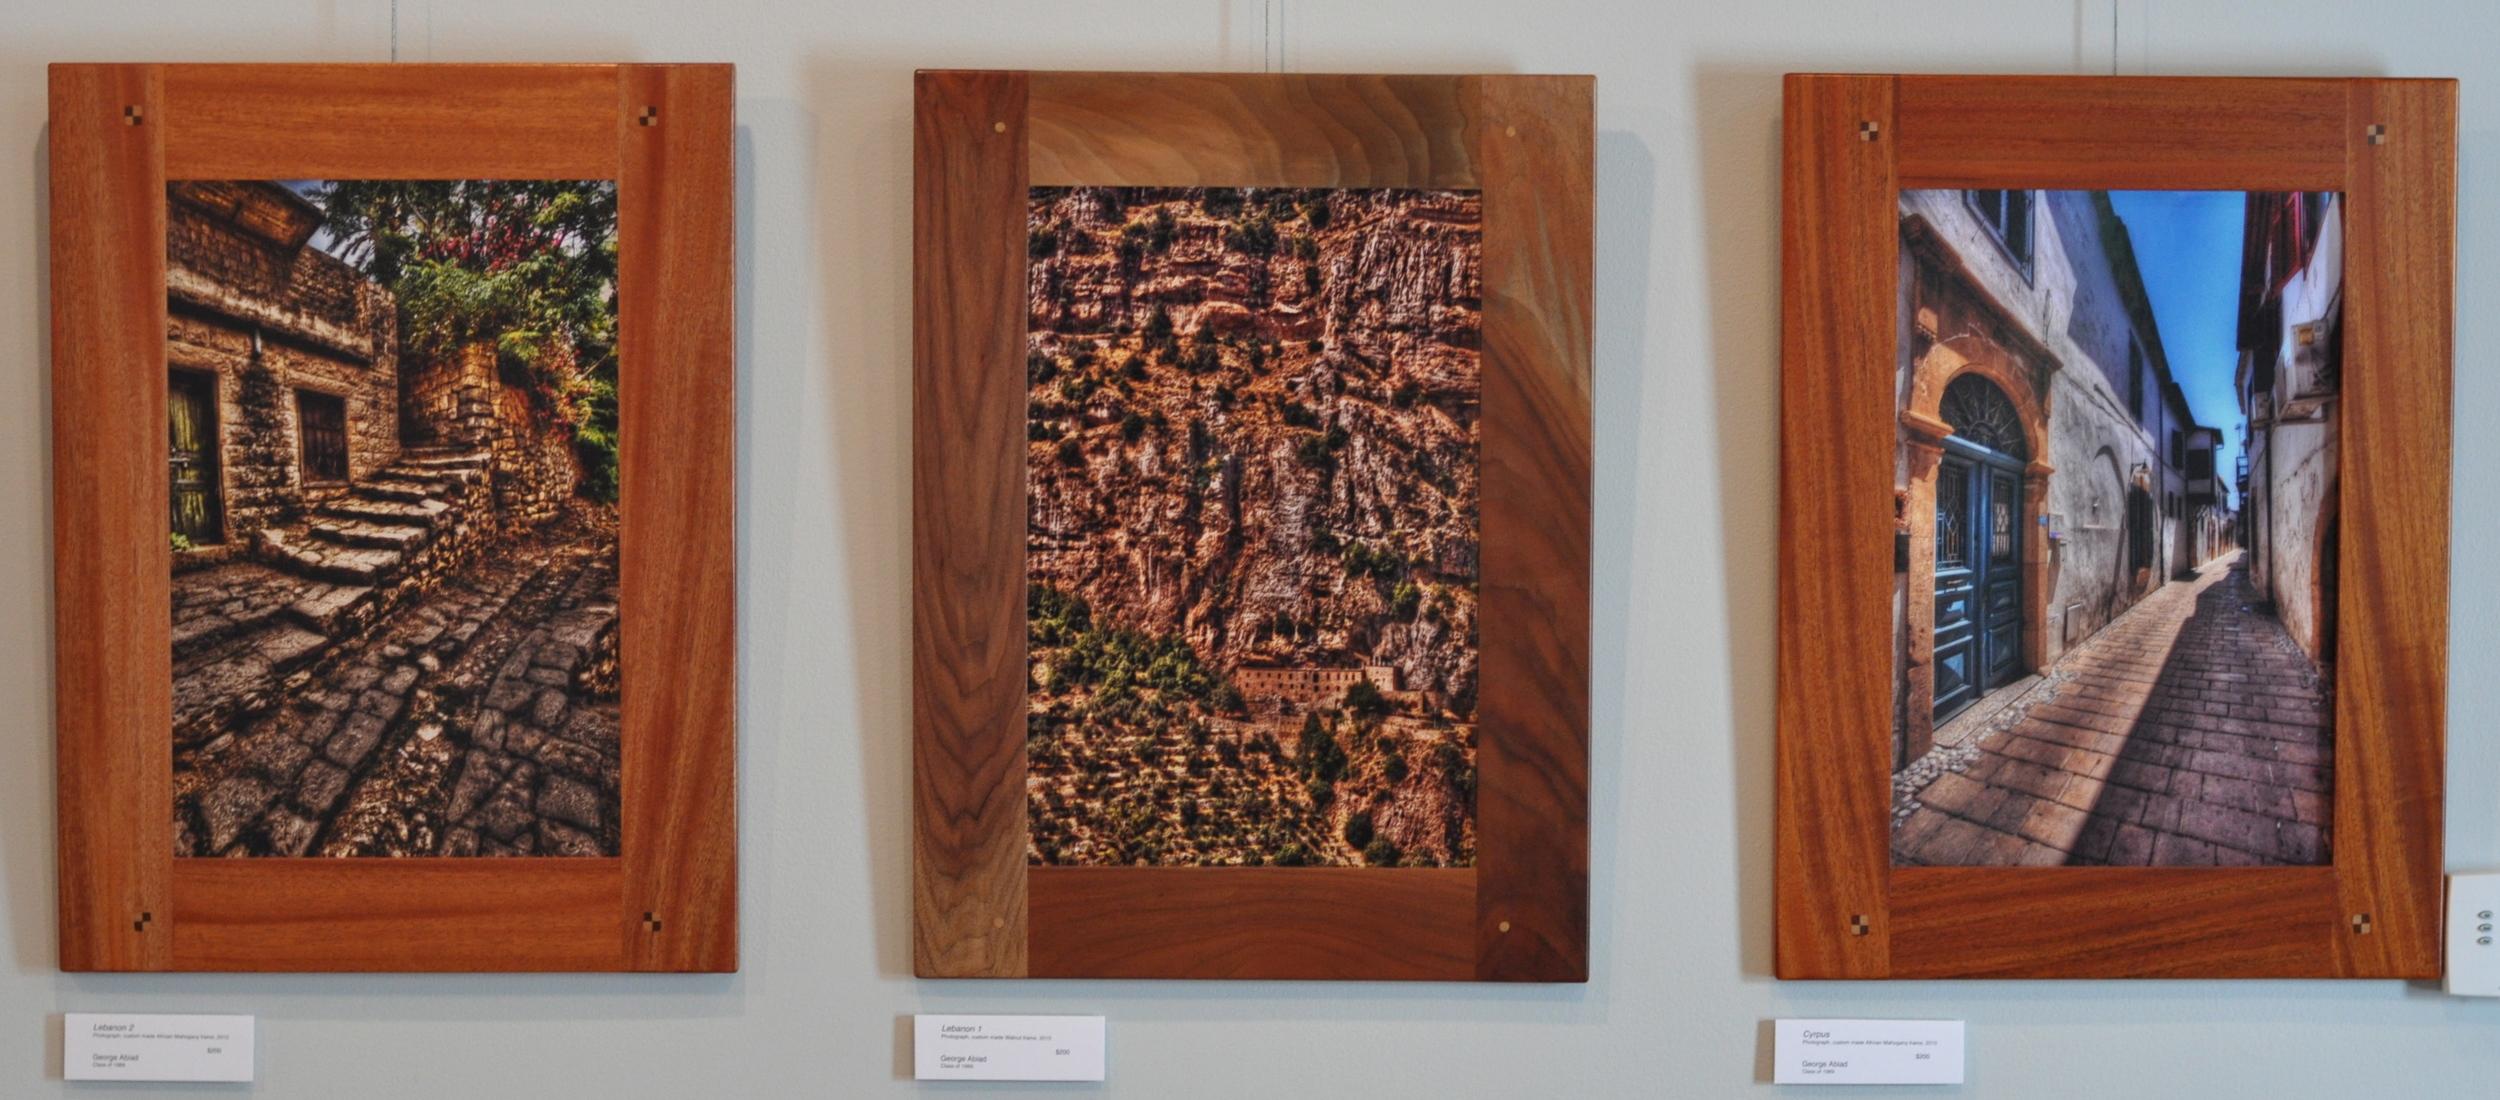 """Lebanon 2"" (left)   Photograph, custom mad African Mahogany frame, 2010    ""Lebanon 1"" (center)   Photograph, custom made Walnut frame, 2010    ""Cyprus"" (right) Photograph, custom made African Mahogany frame, 2010  George Abiad Class of 1989"